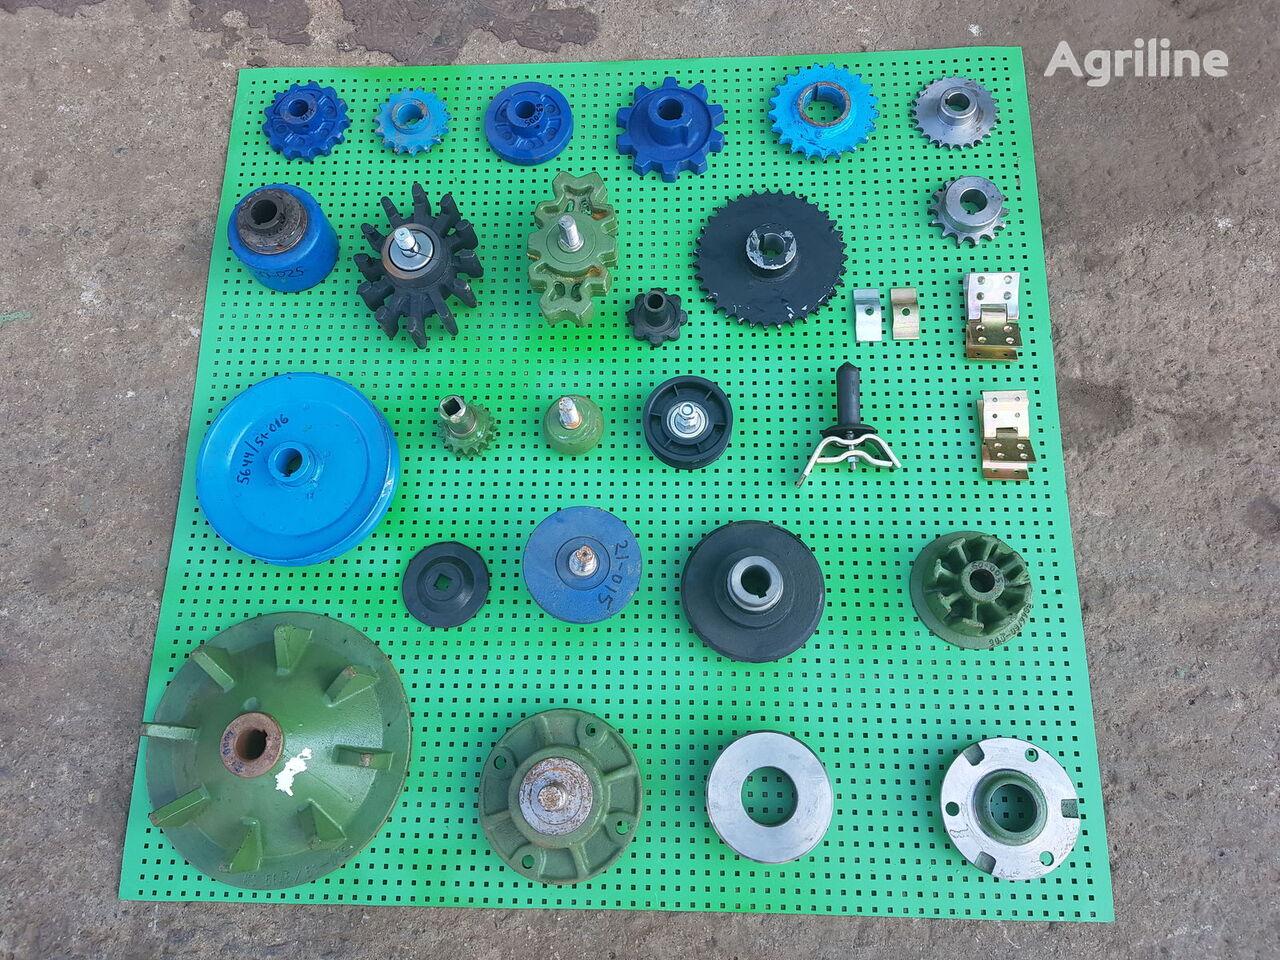 Zapchastini do kartoplezbiralnih kombayniv other operating parts for GRIMME ANNA, BOLKO, HASSIA, KTN  potato digger